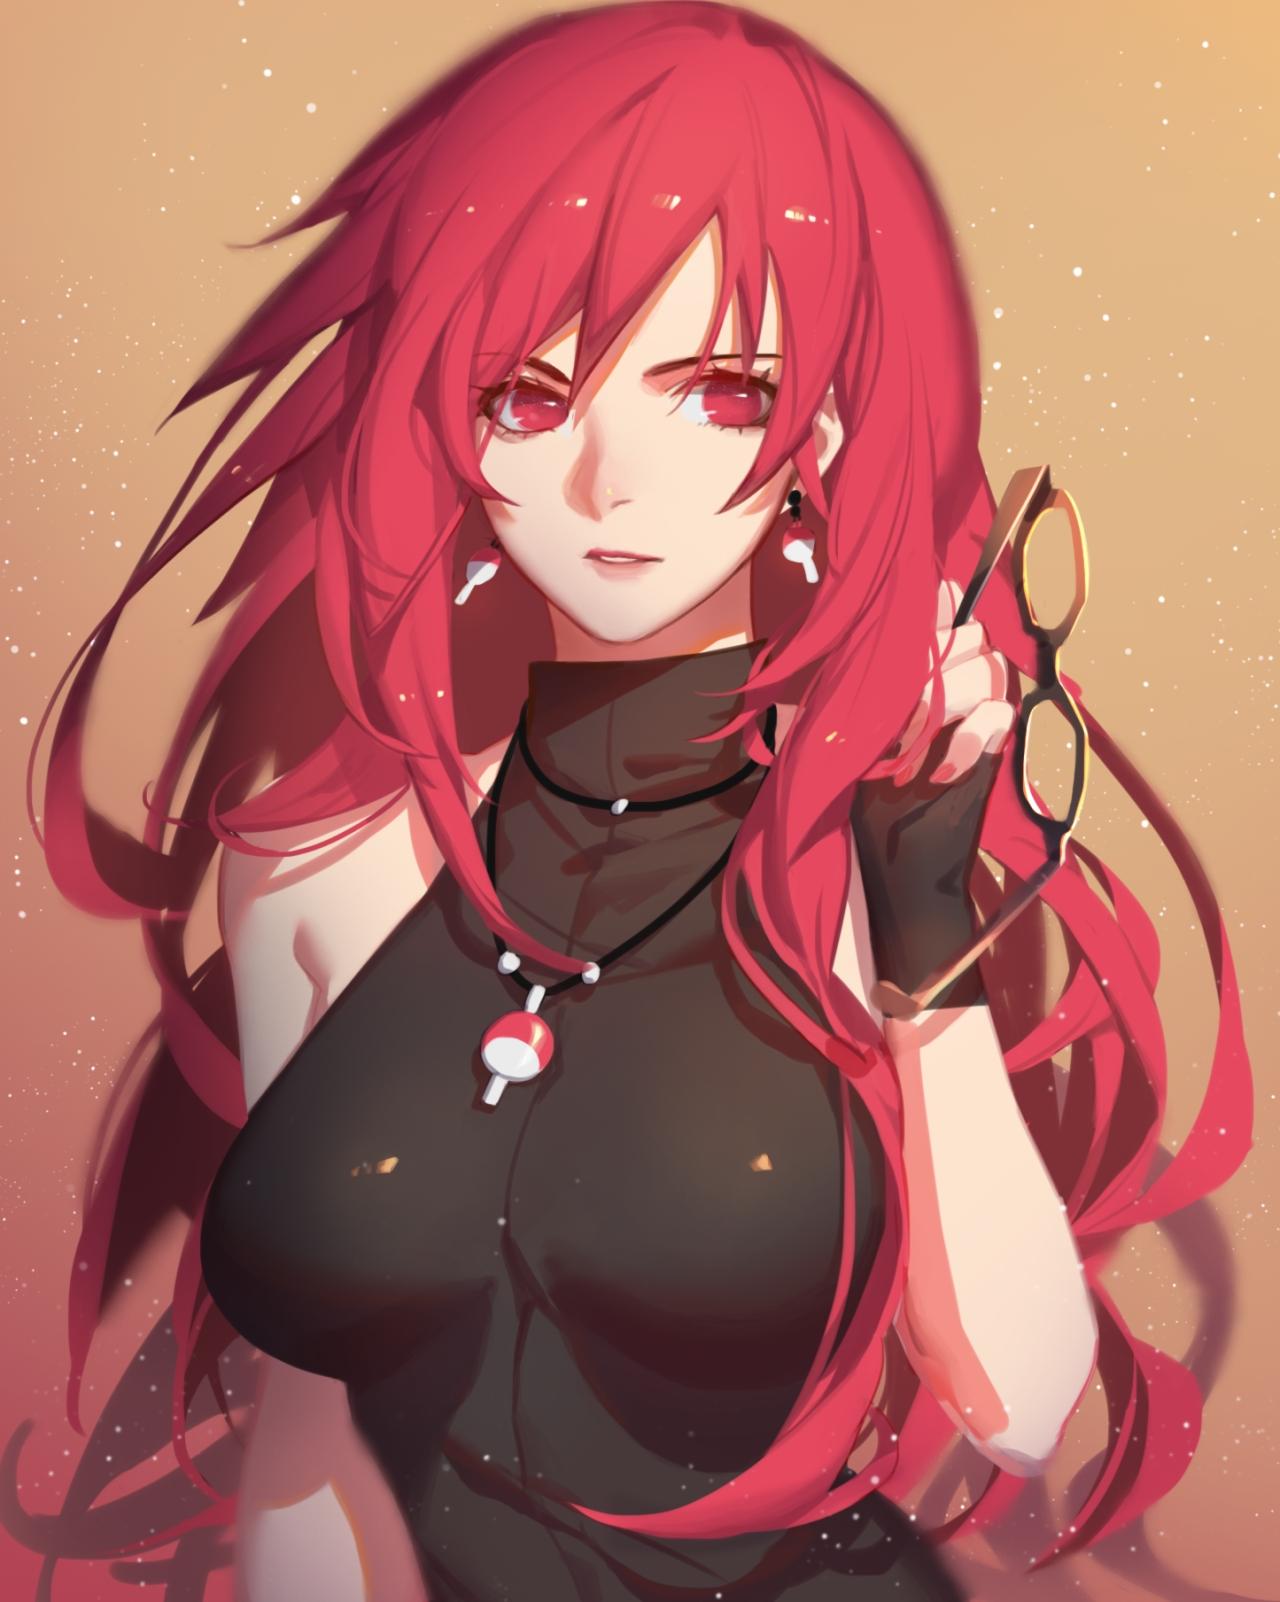 Karin | Narutopedia | FANDOM powered by Wikia